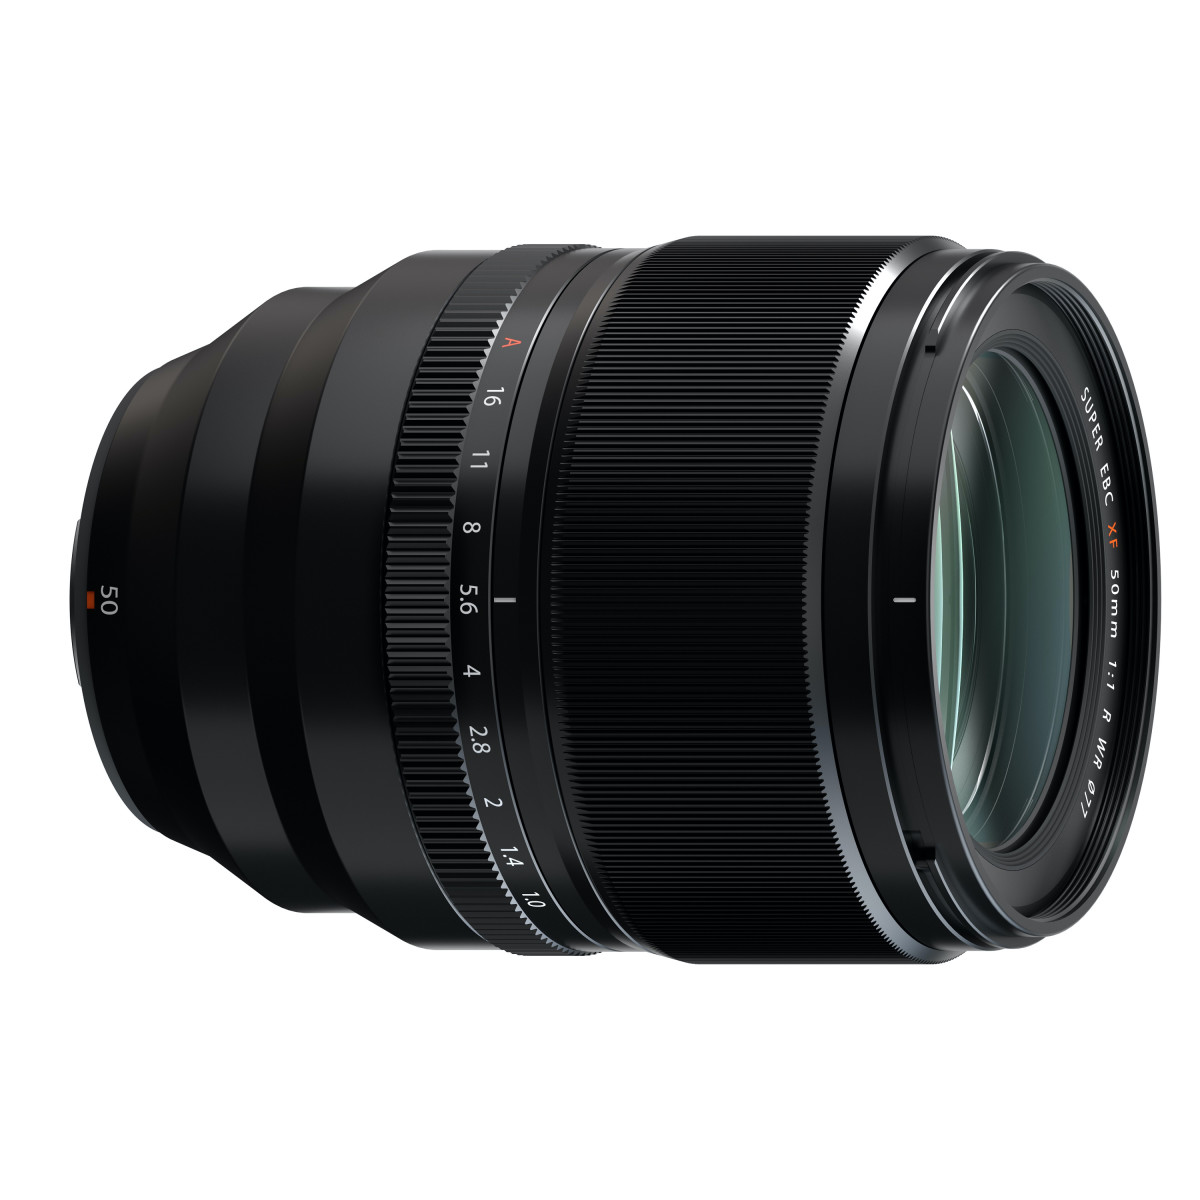 Fujifilm 50mm f/1